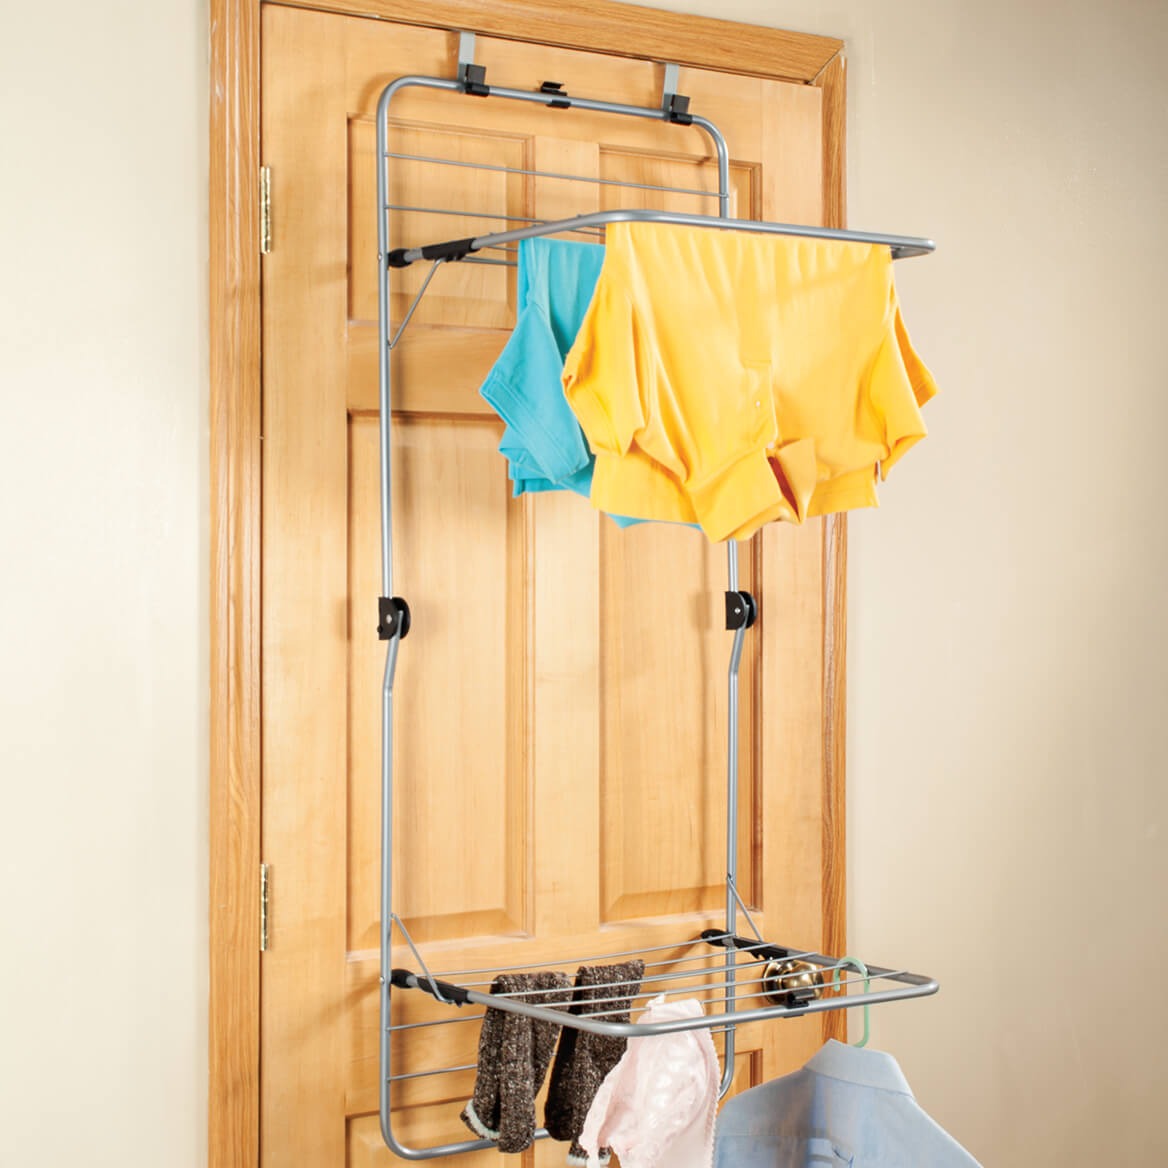 2 Tier Over The Door Drying Rack Clothes Drying Rack Walter Drake